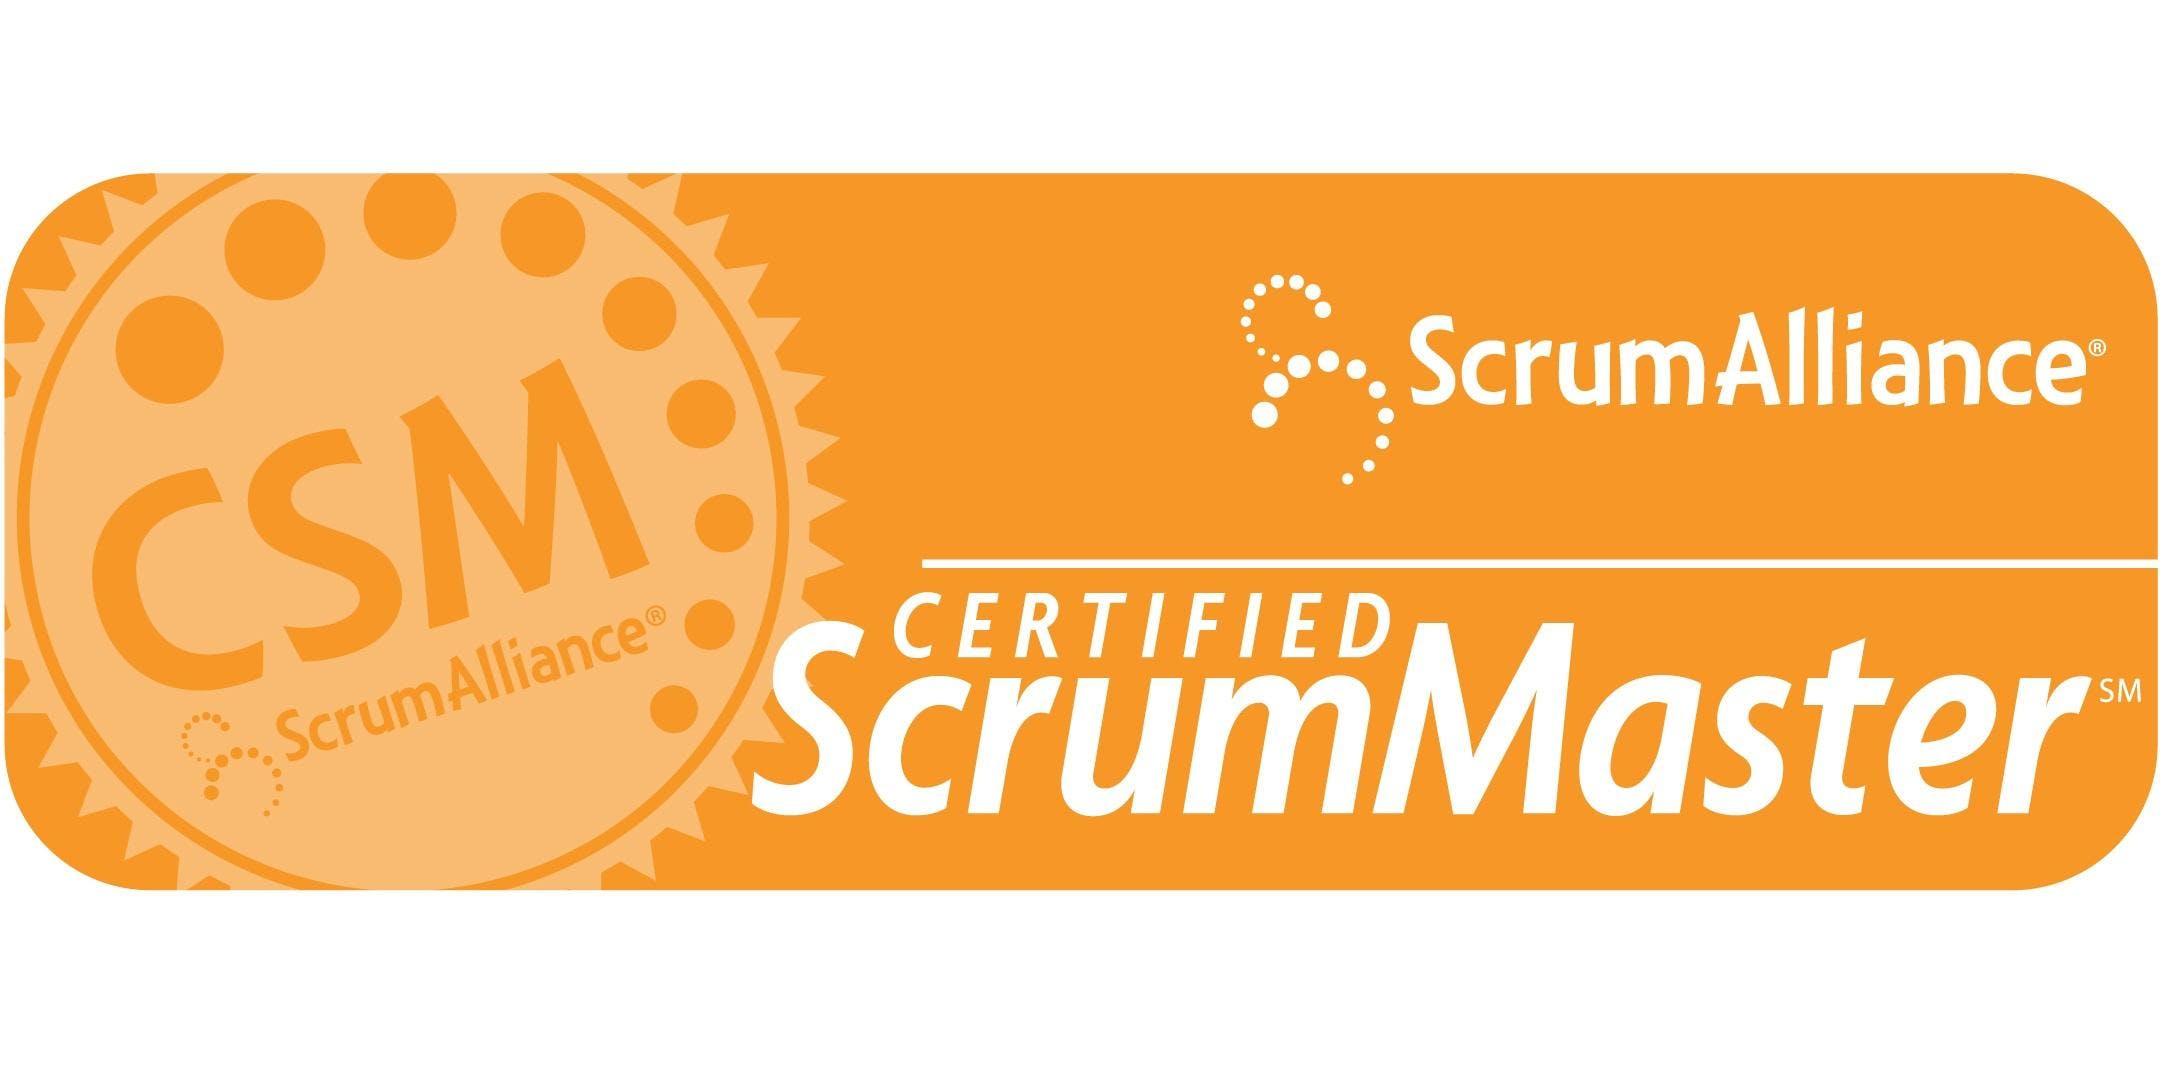 Certified Scrummaster Training Csm Training 10 11 May 2018